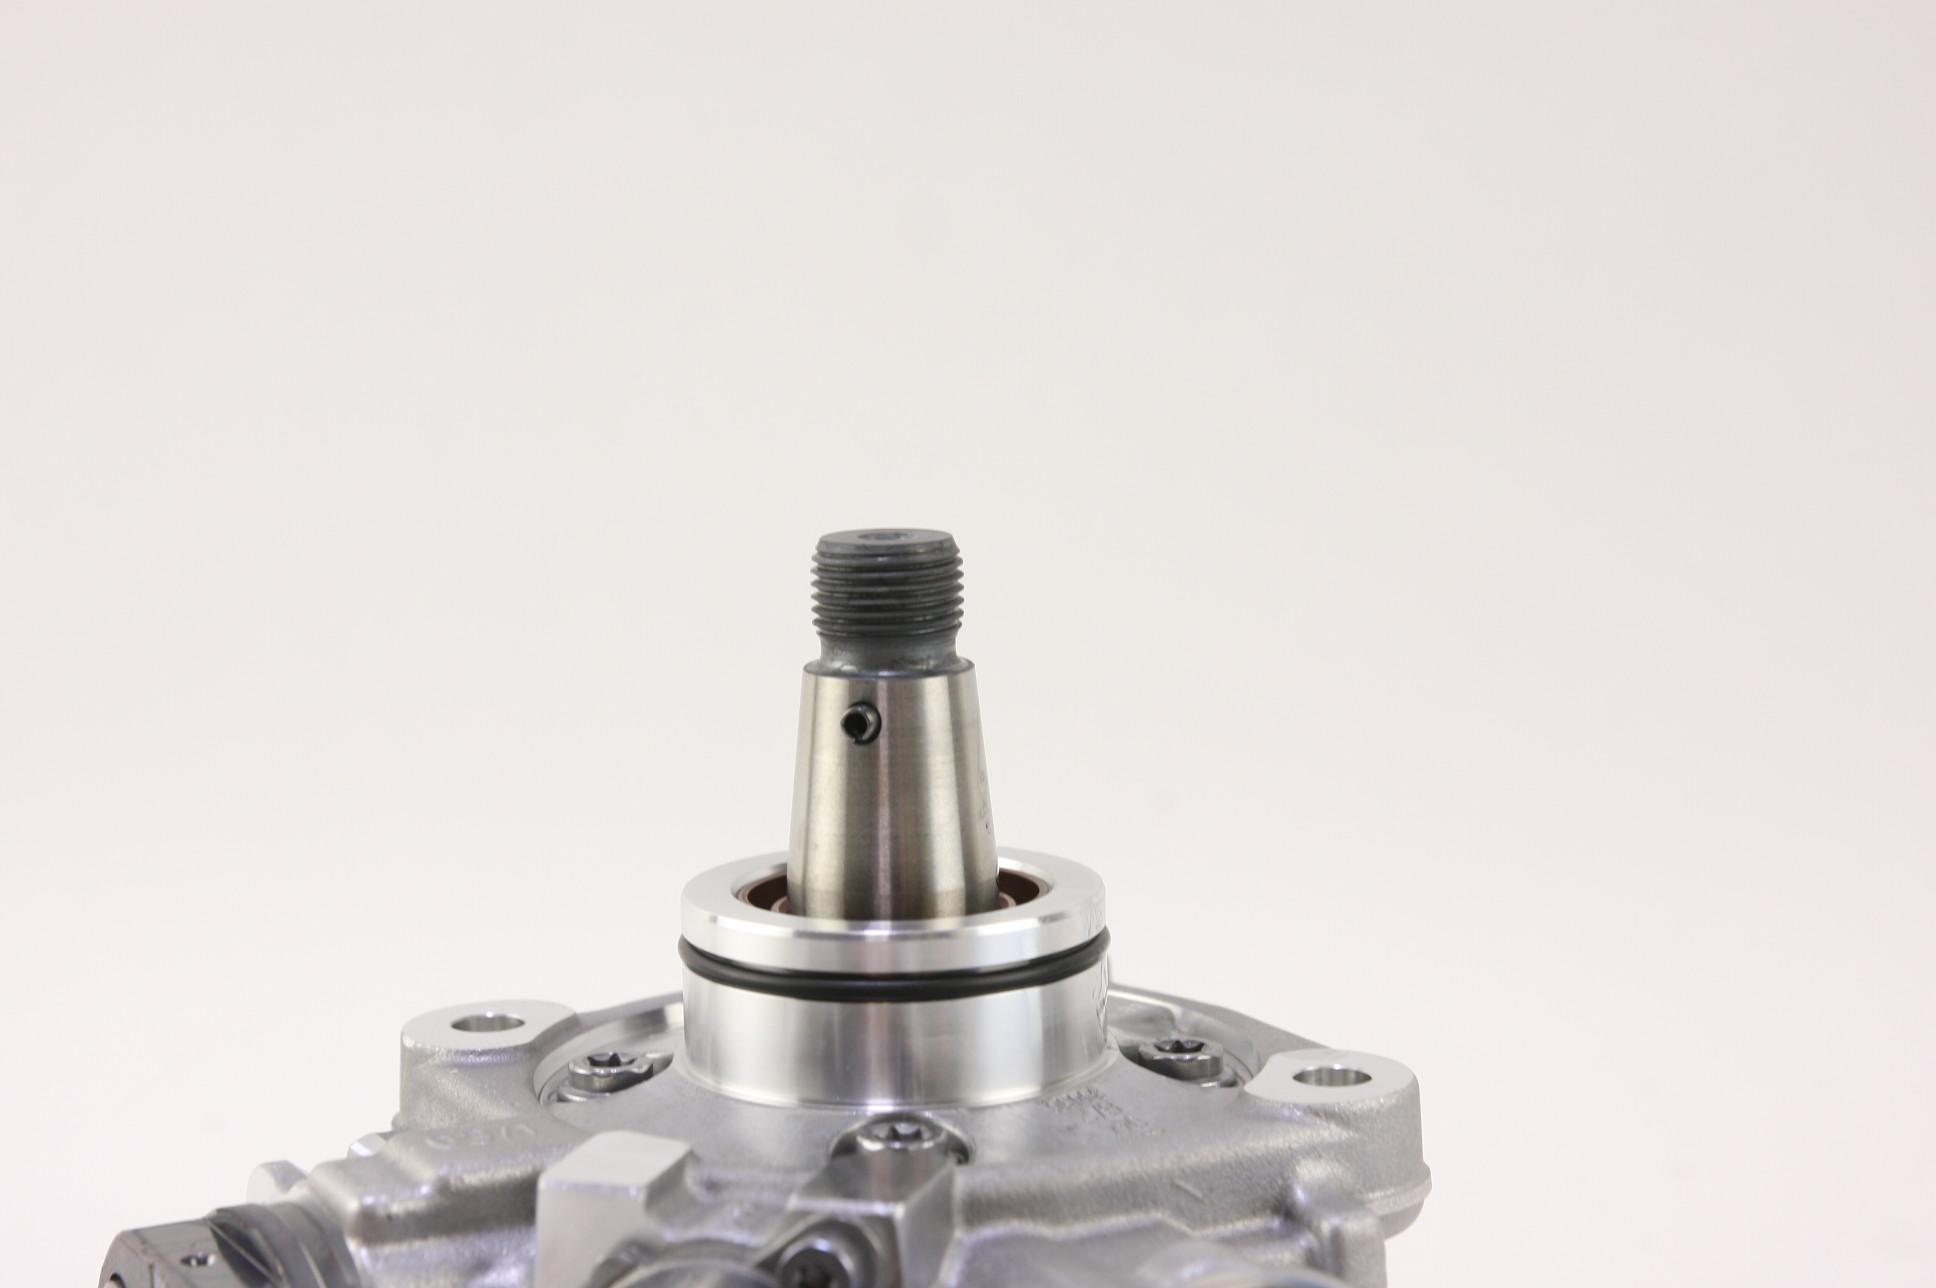 * New OEM BC3Z9A543A Ford 11-15 6.7L Powerstroke High Pressure Fuel Pump NIP - image 3